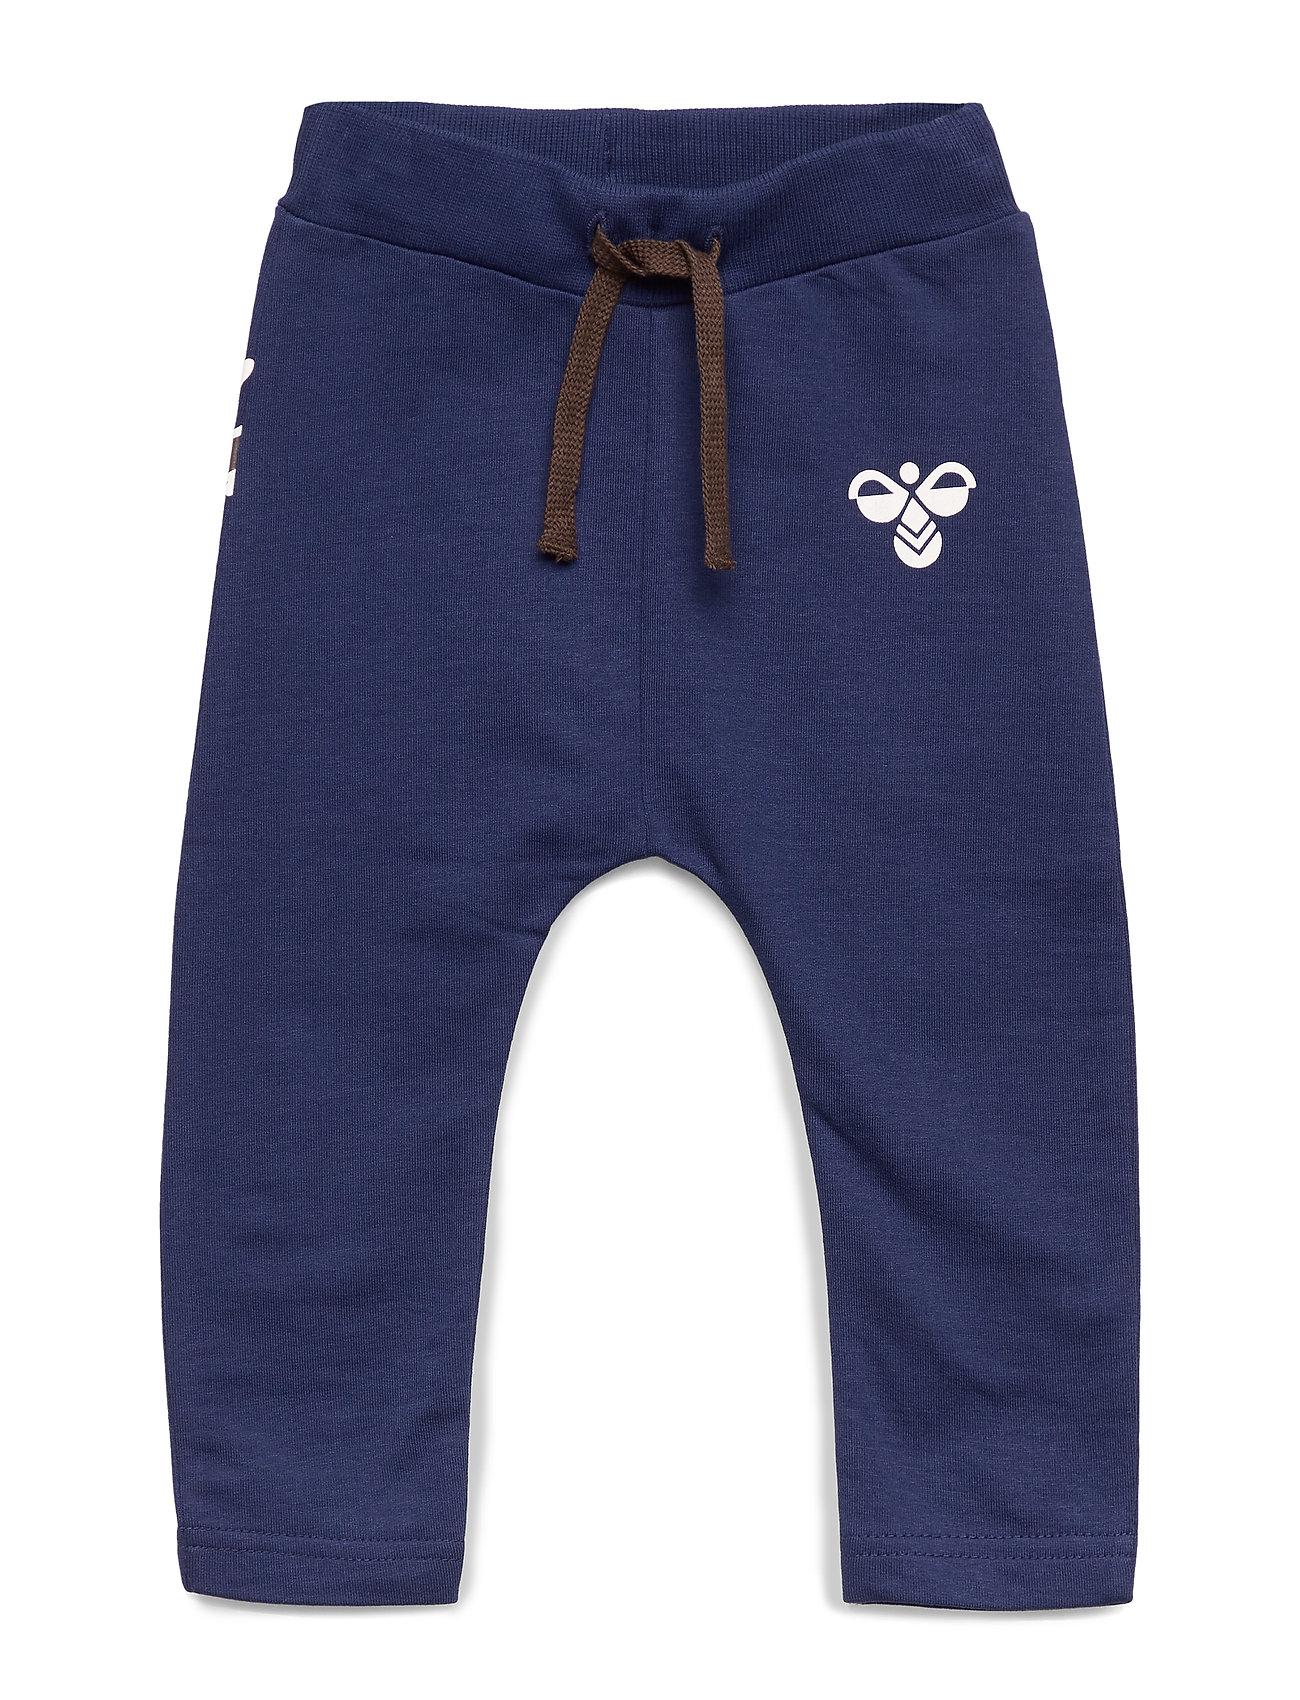 Hummel hmlJEPPE PANTS - PATRIOT BLUE